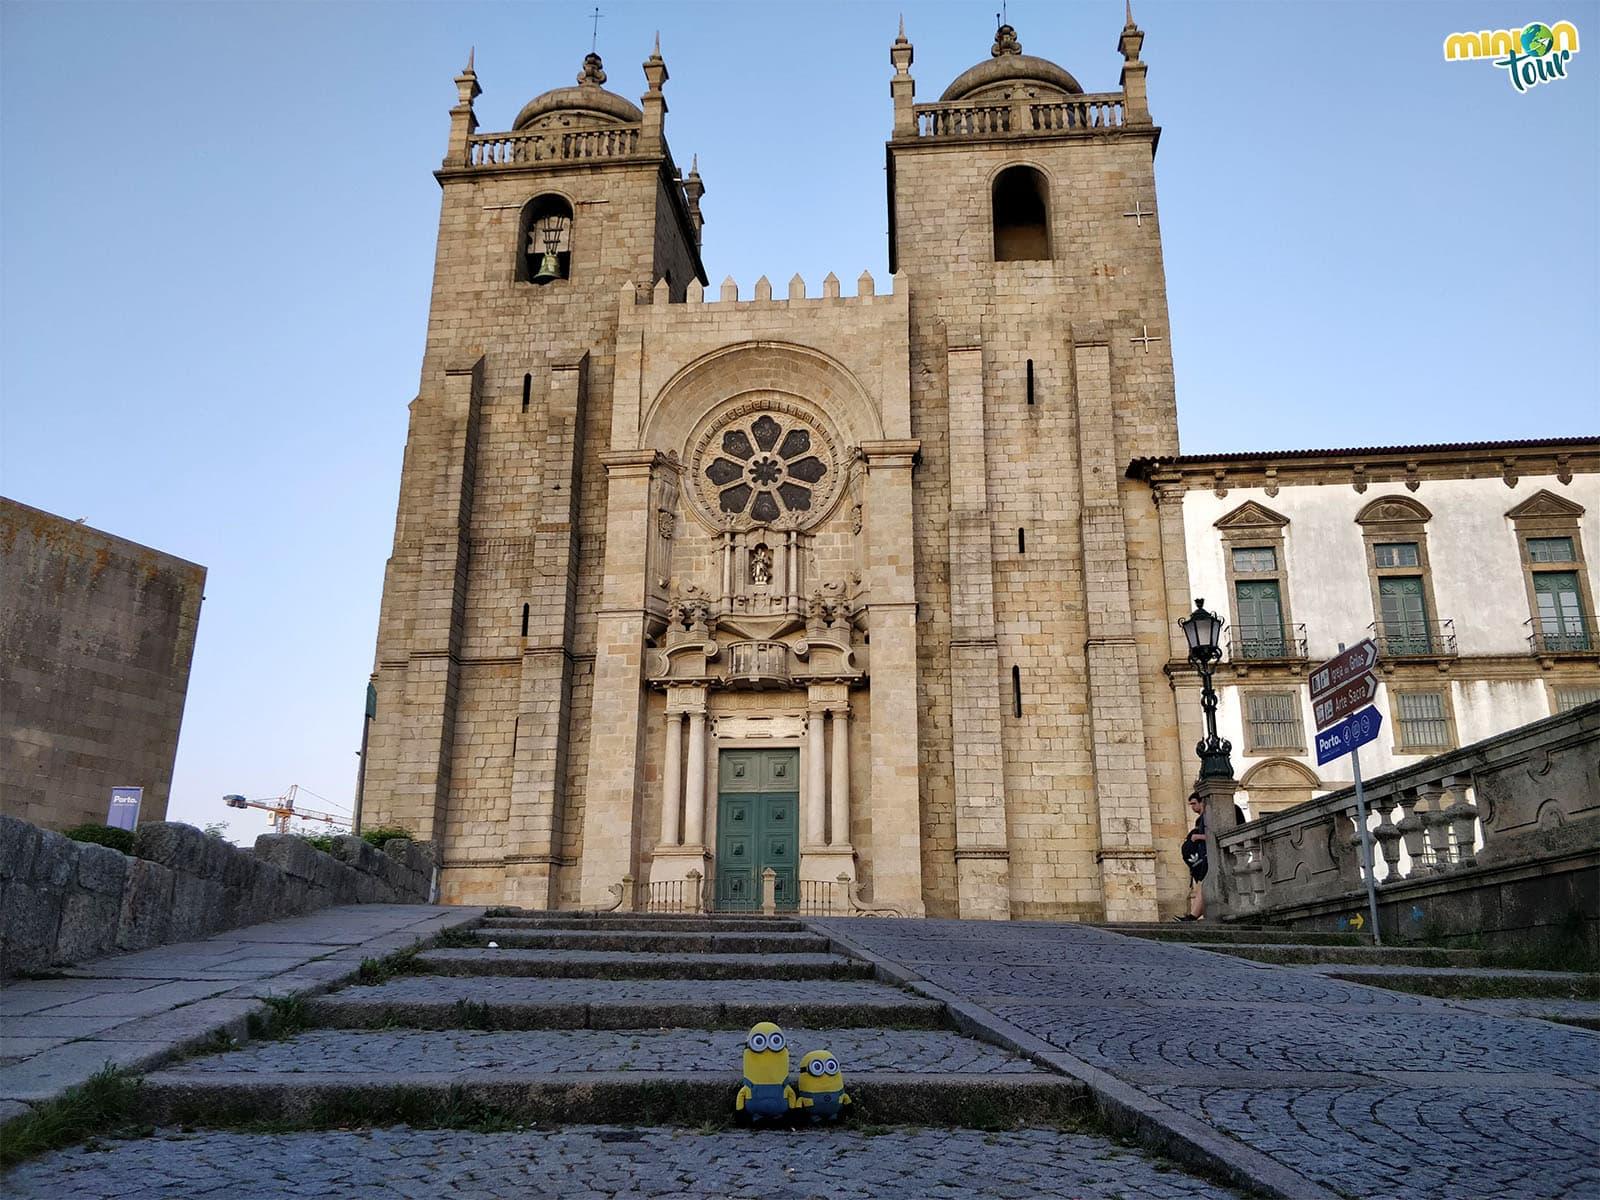 La Catedral de Oporto de frente